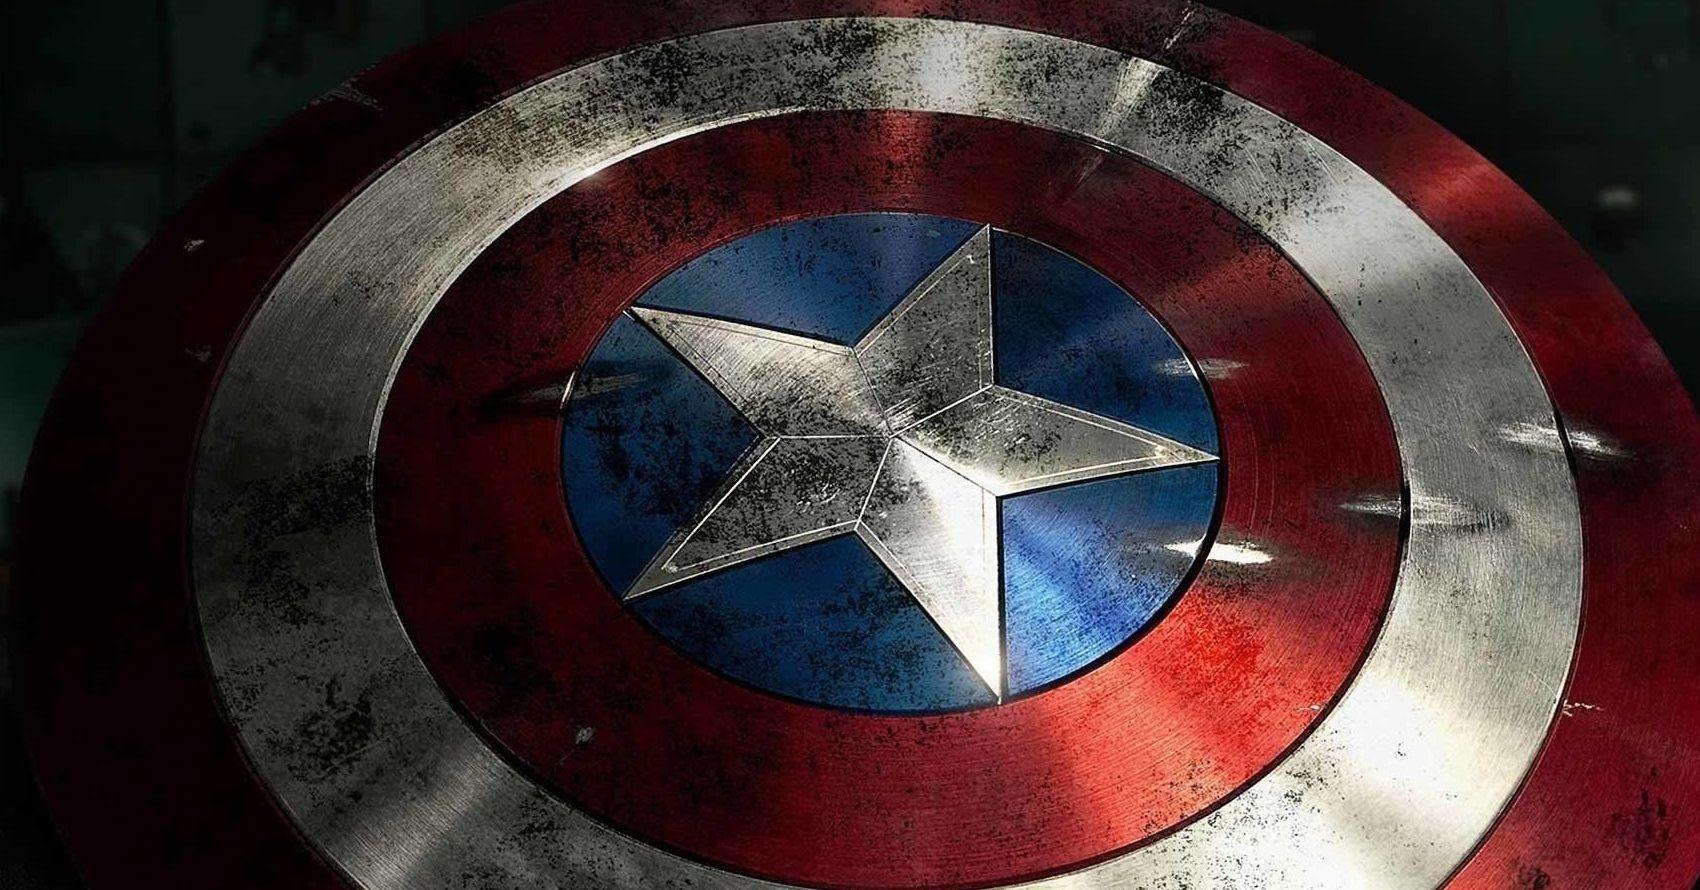 Ultimato Arte Mostra Thanos Estilhacando Escudo Do Capitao America